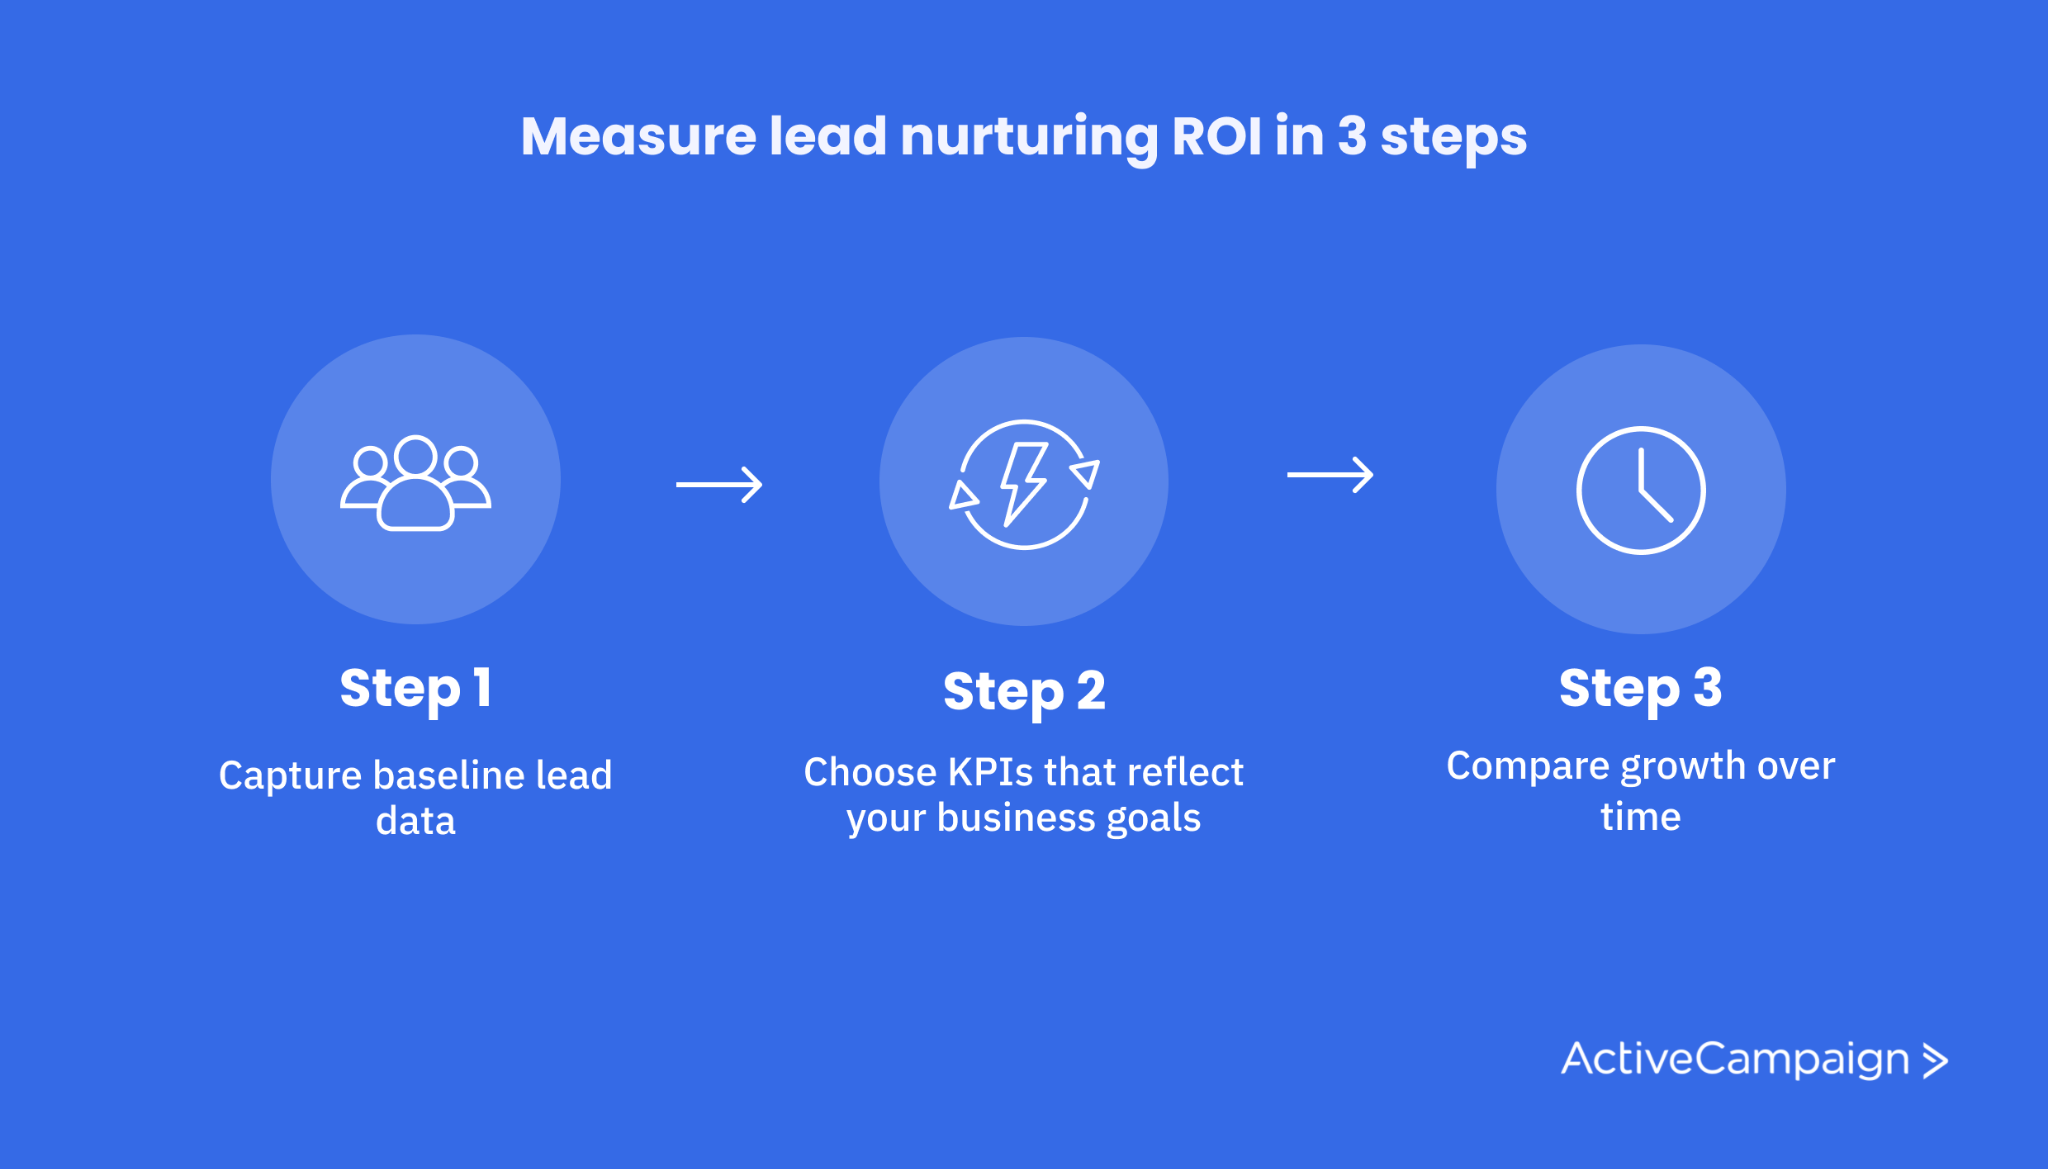 How to measure lead nurturing ROI in 3 steps